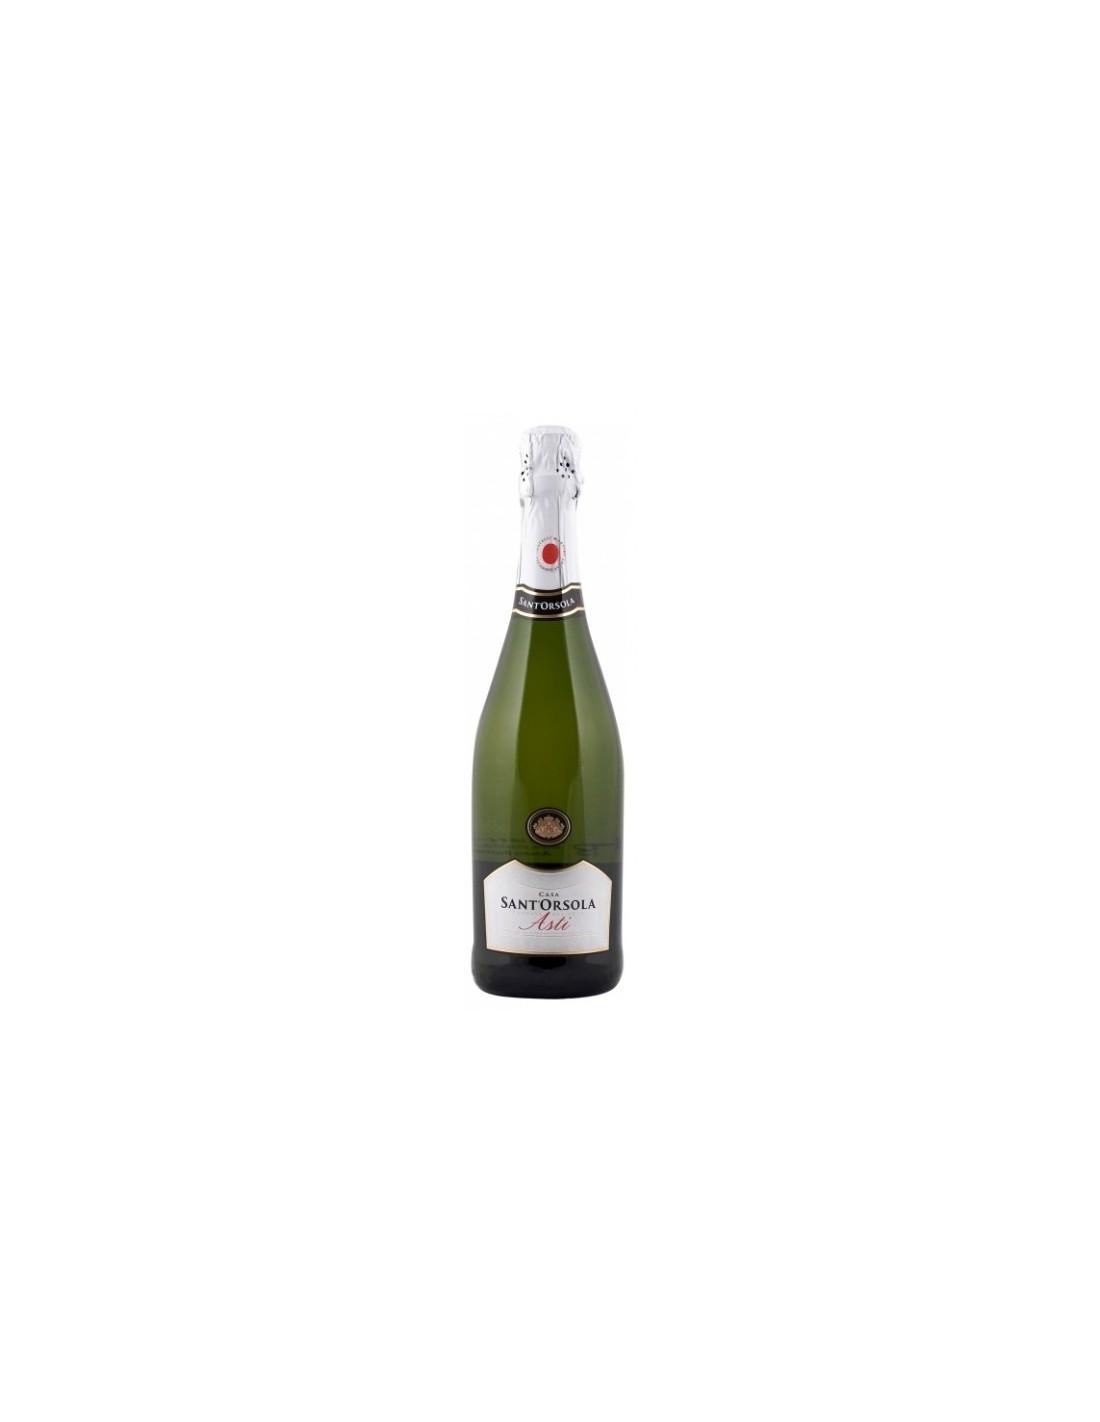 Vin spumant alb, Casa Sant'Orsola Asti, 0.75L, 10% alc., Italia